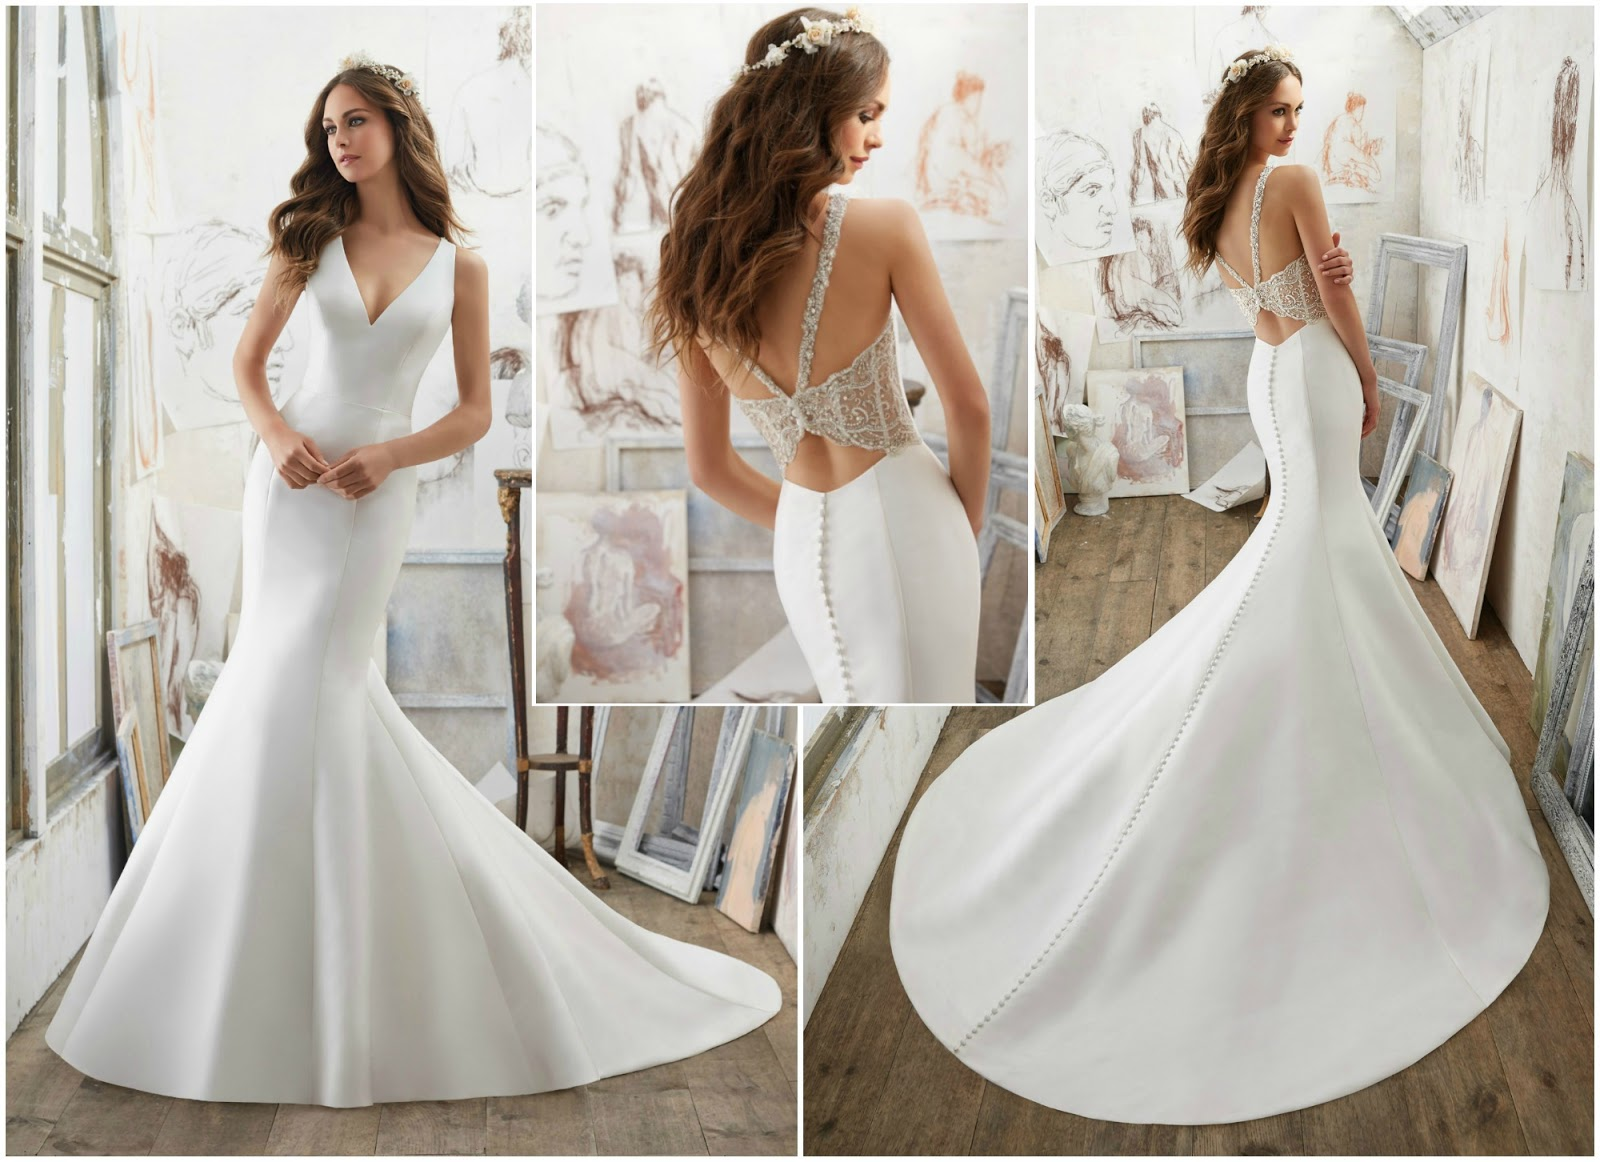 Brides of america miami miami fl wedding dress for Miami wedding dresses